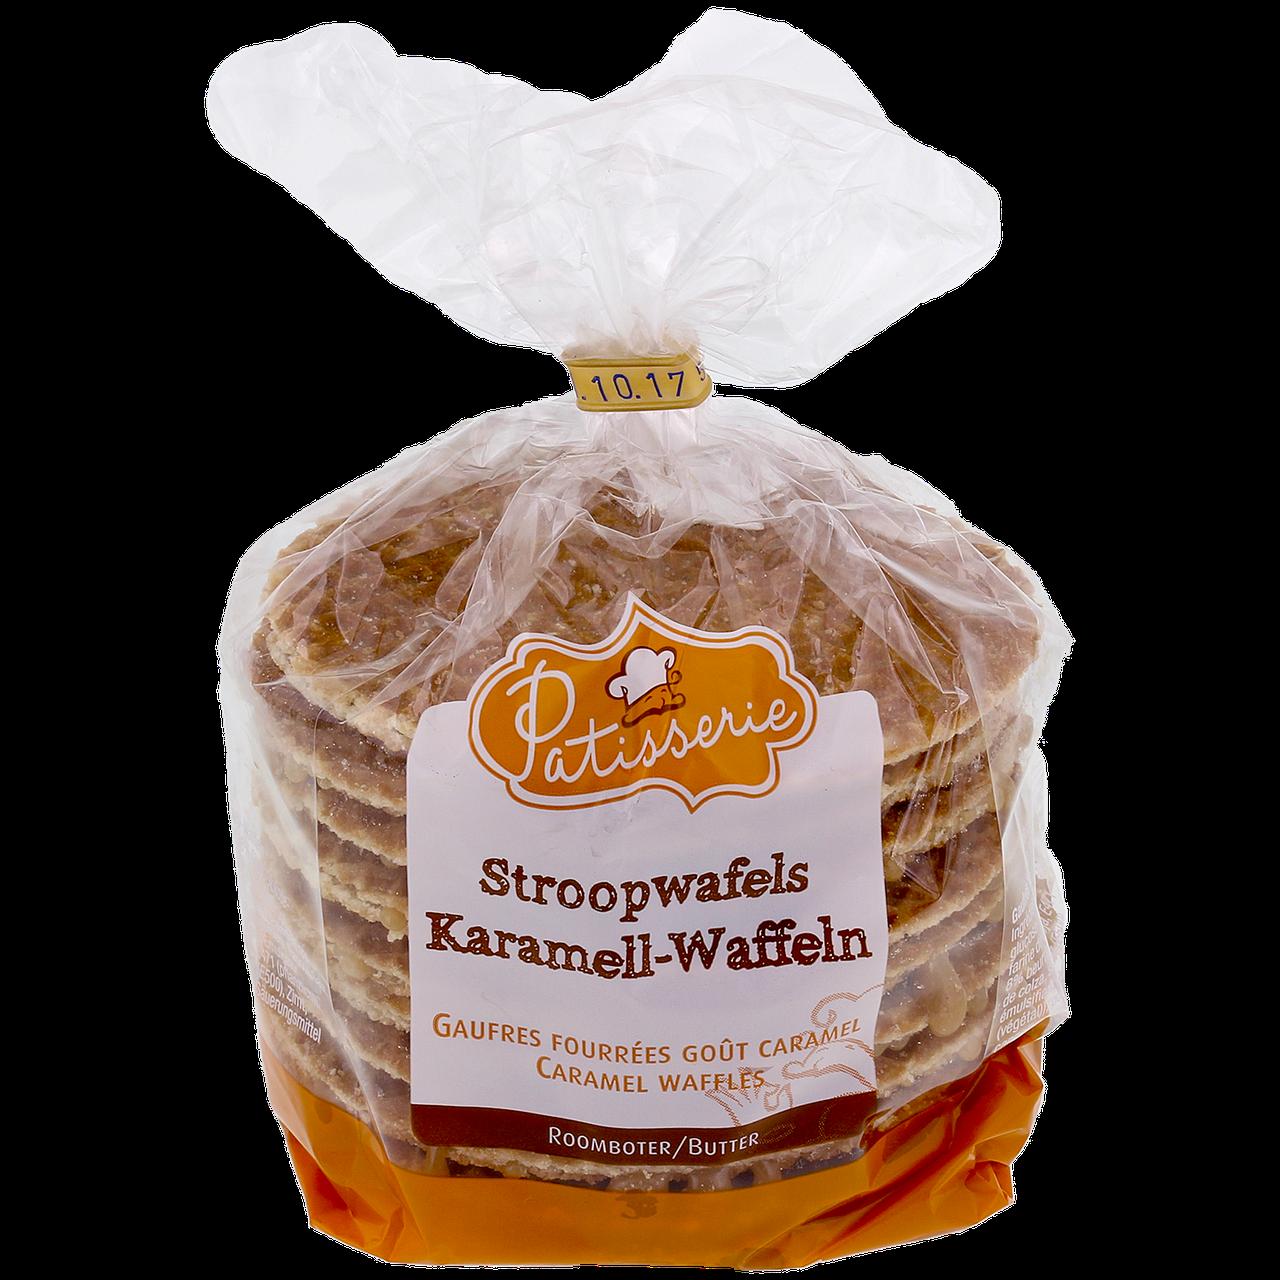 Вафли Stroopwafels Patisserie 400г  с карамелью (Нидерланды)